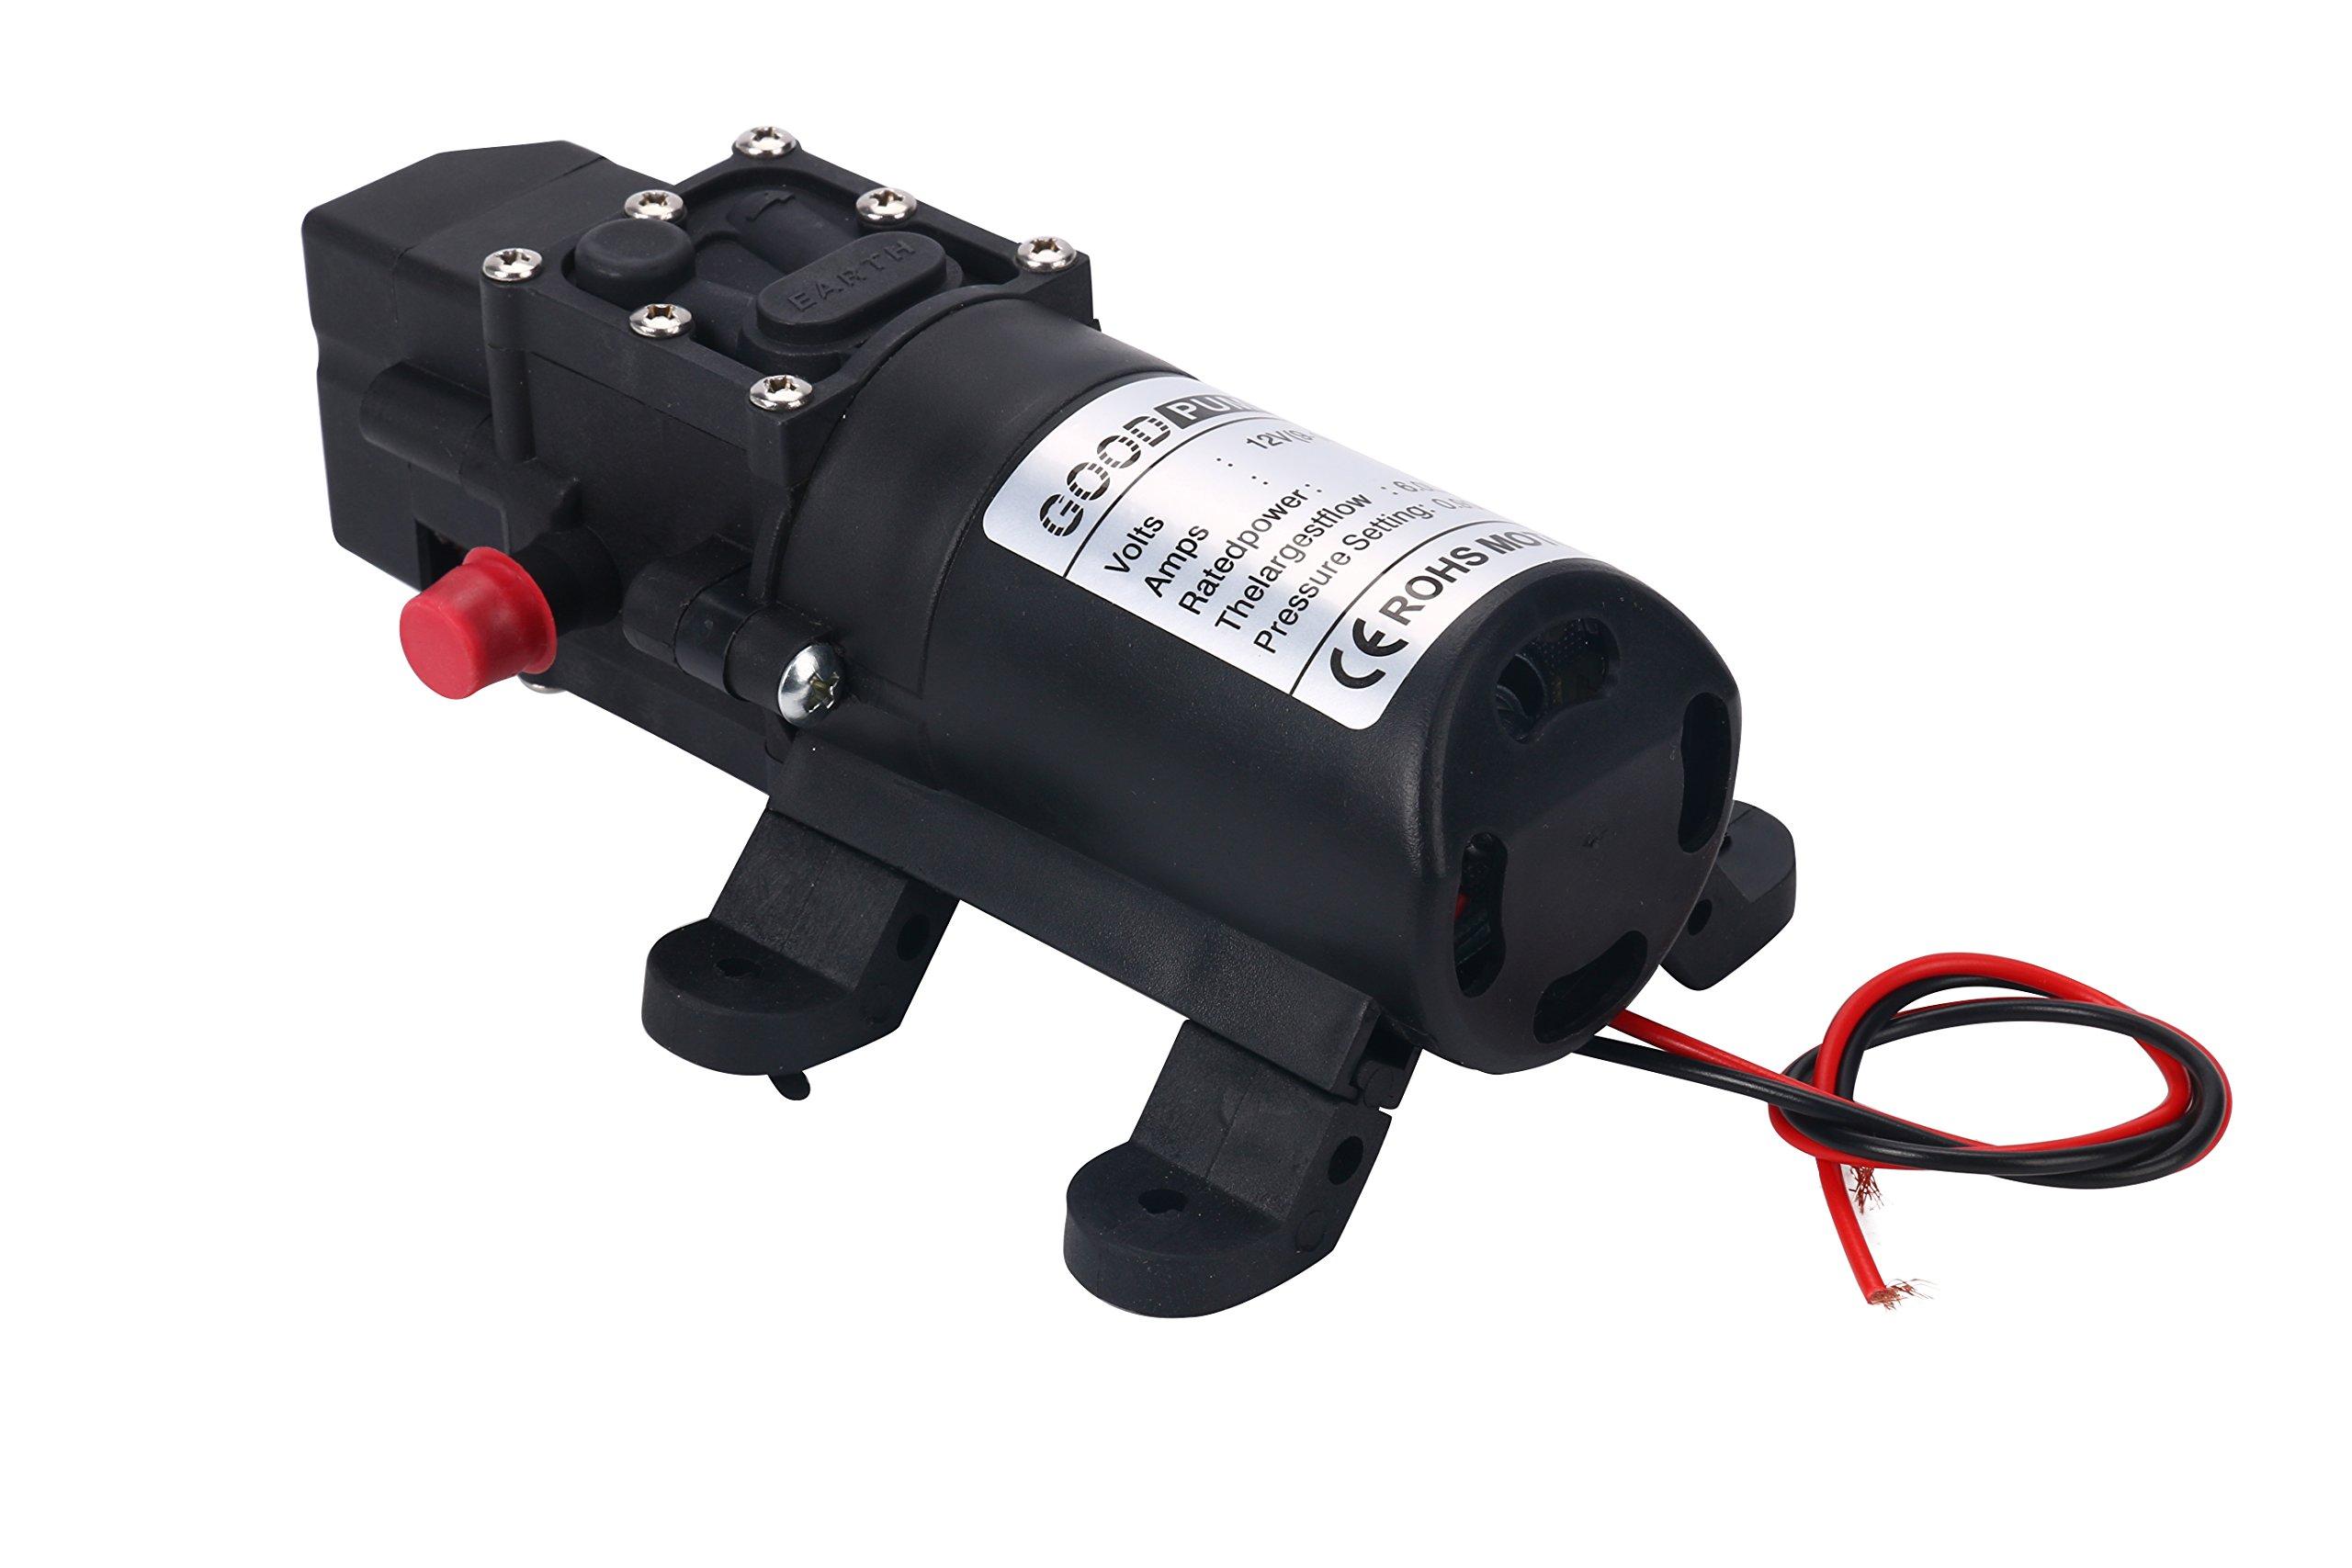 Amarine-made 12V Water Pressure Diaphragm Pump 5.0 L/min 1.3 GPM 60W Self Priming RV Booster Sprayer Pump Micropump For Home Garden Caravan/RV/Boat/Marine